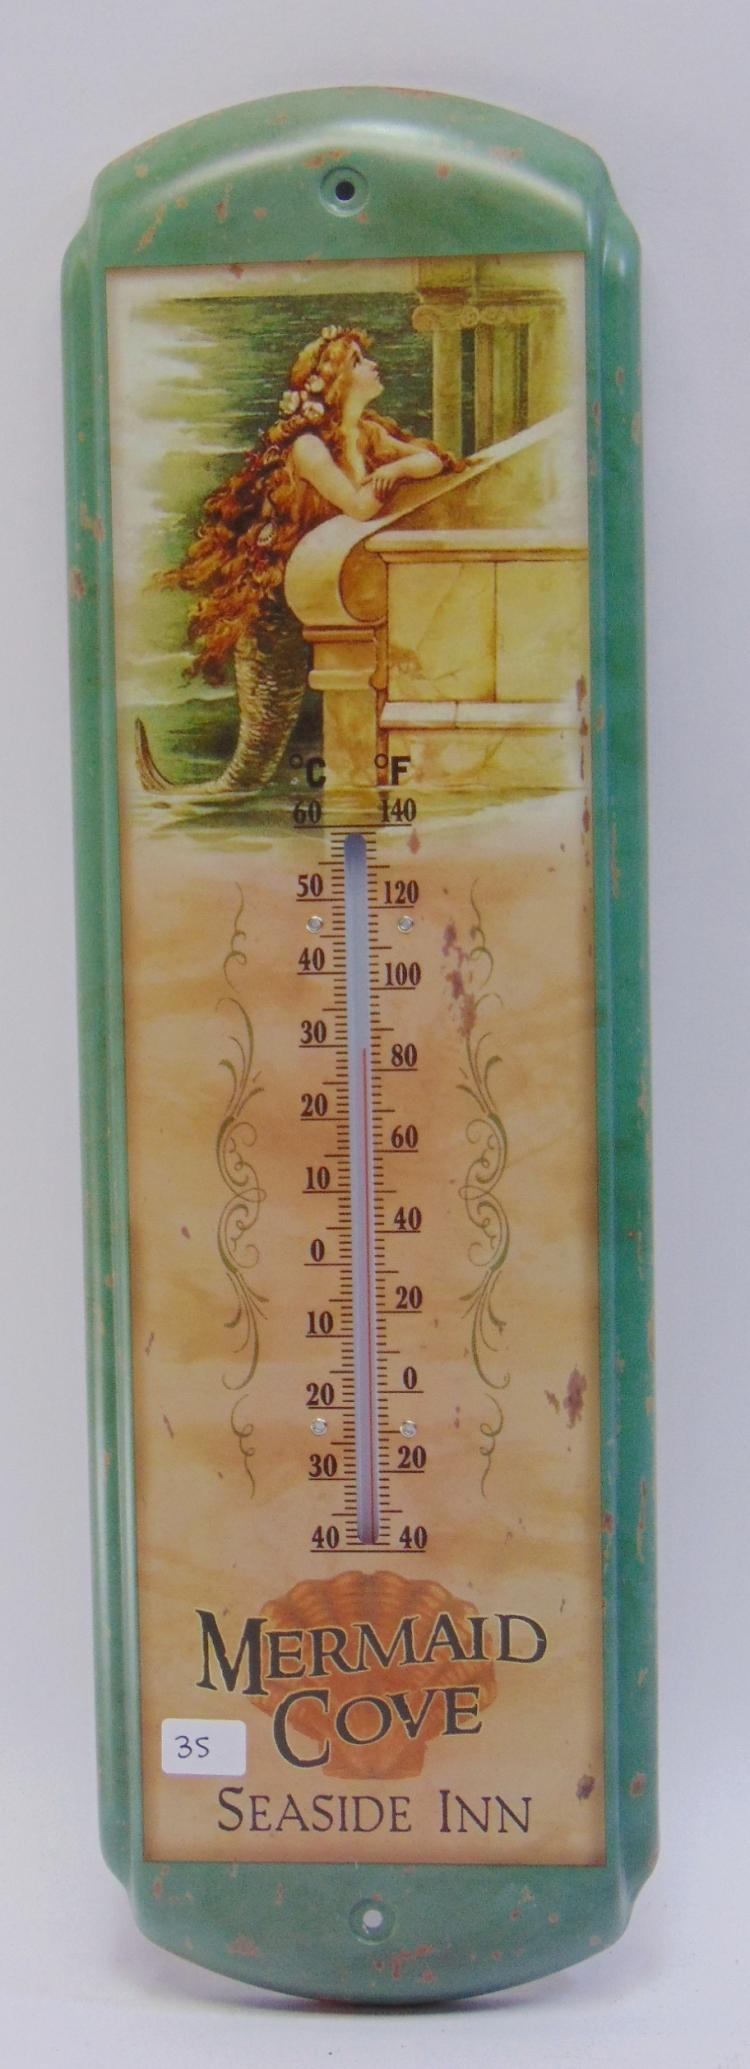 Mermaid Cove Seaside Inn Tin Thermometer